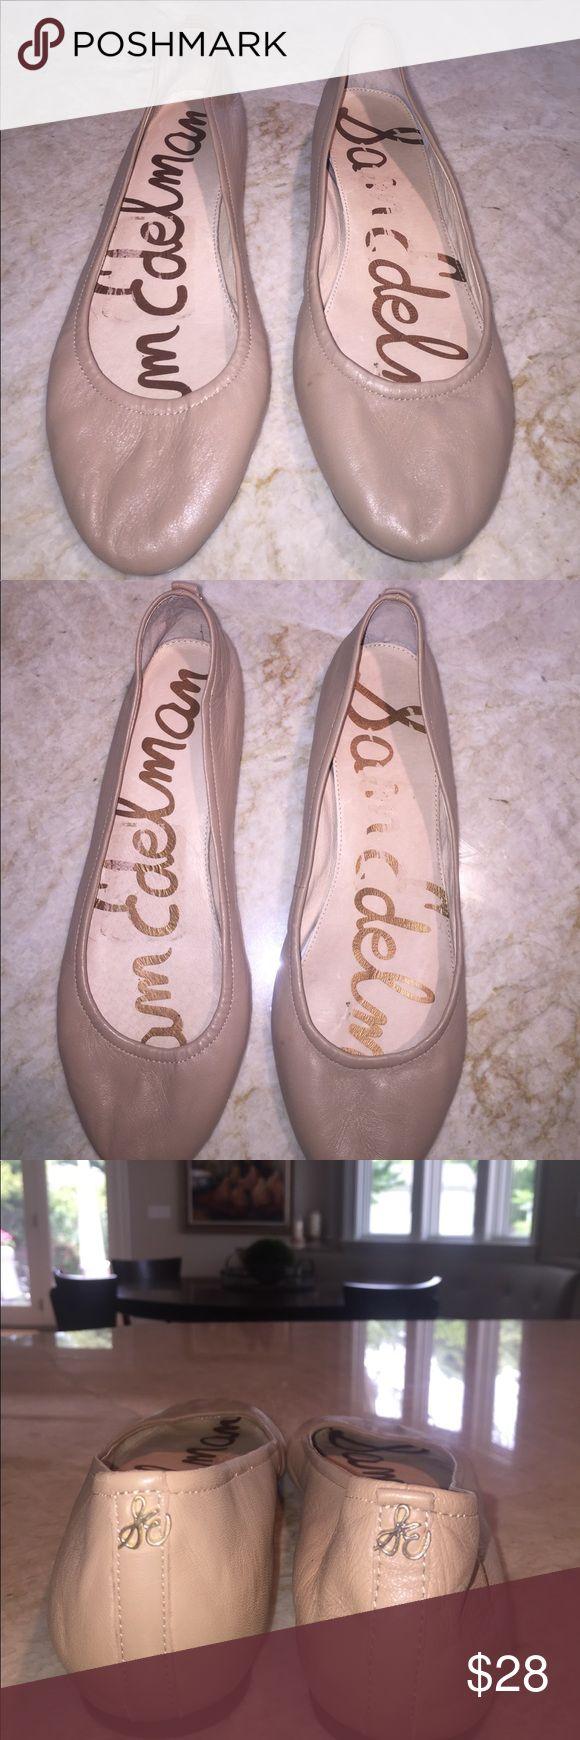 "Sam Edelman noah flats Worn ""noah"" nude leather flats, run a little big Sam Edelman Shoes Flats & Loafers"